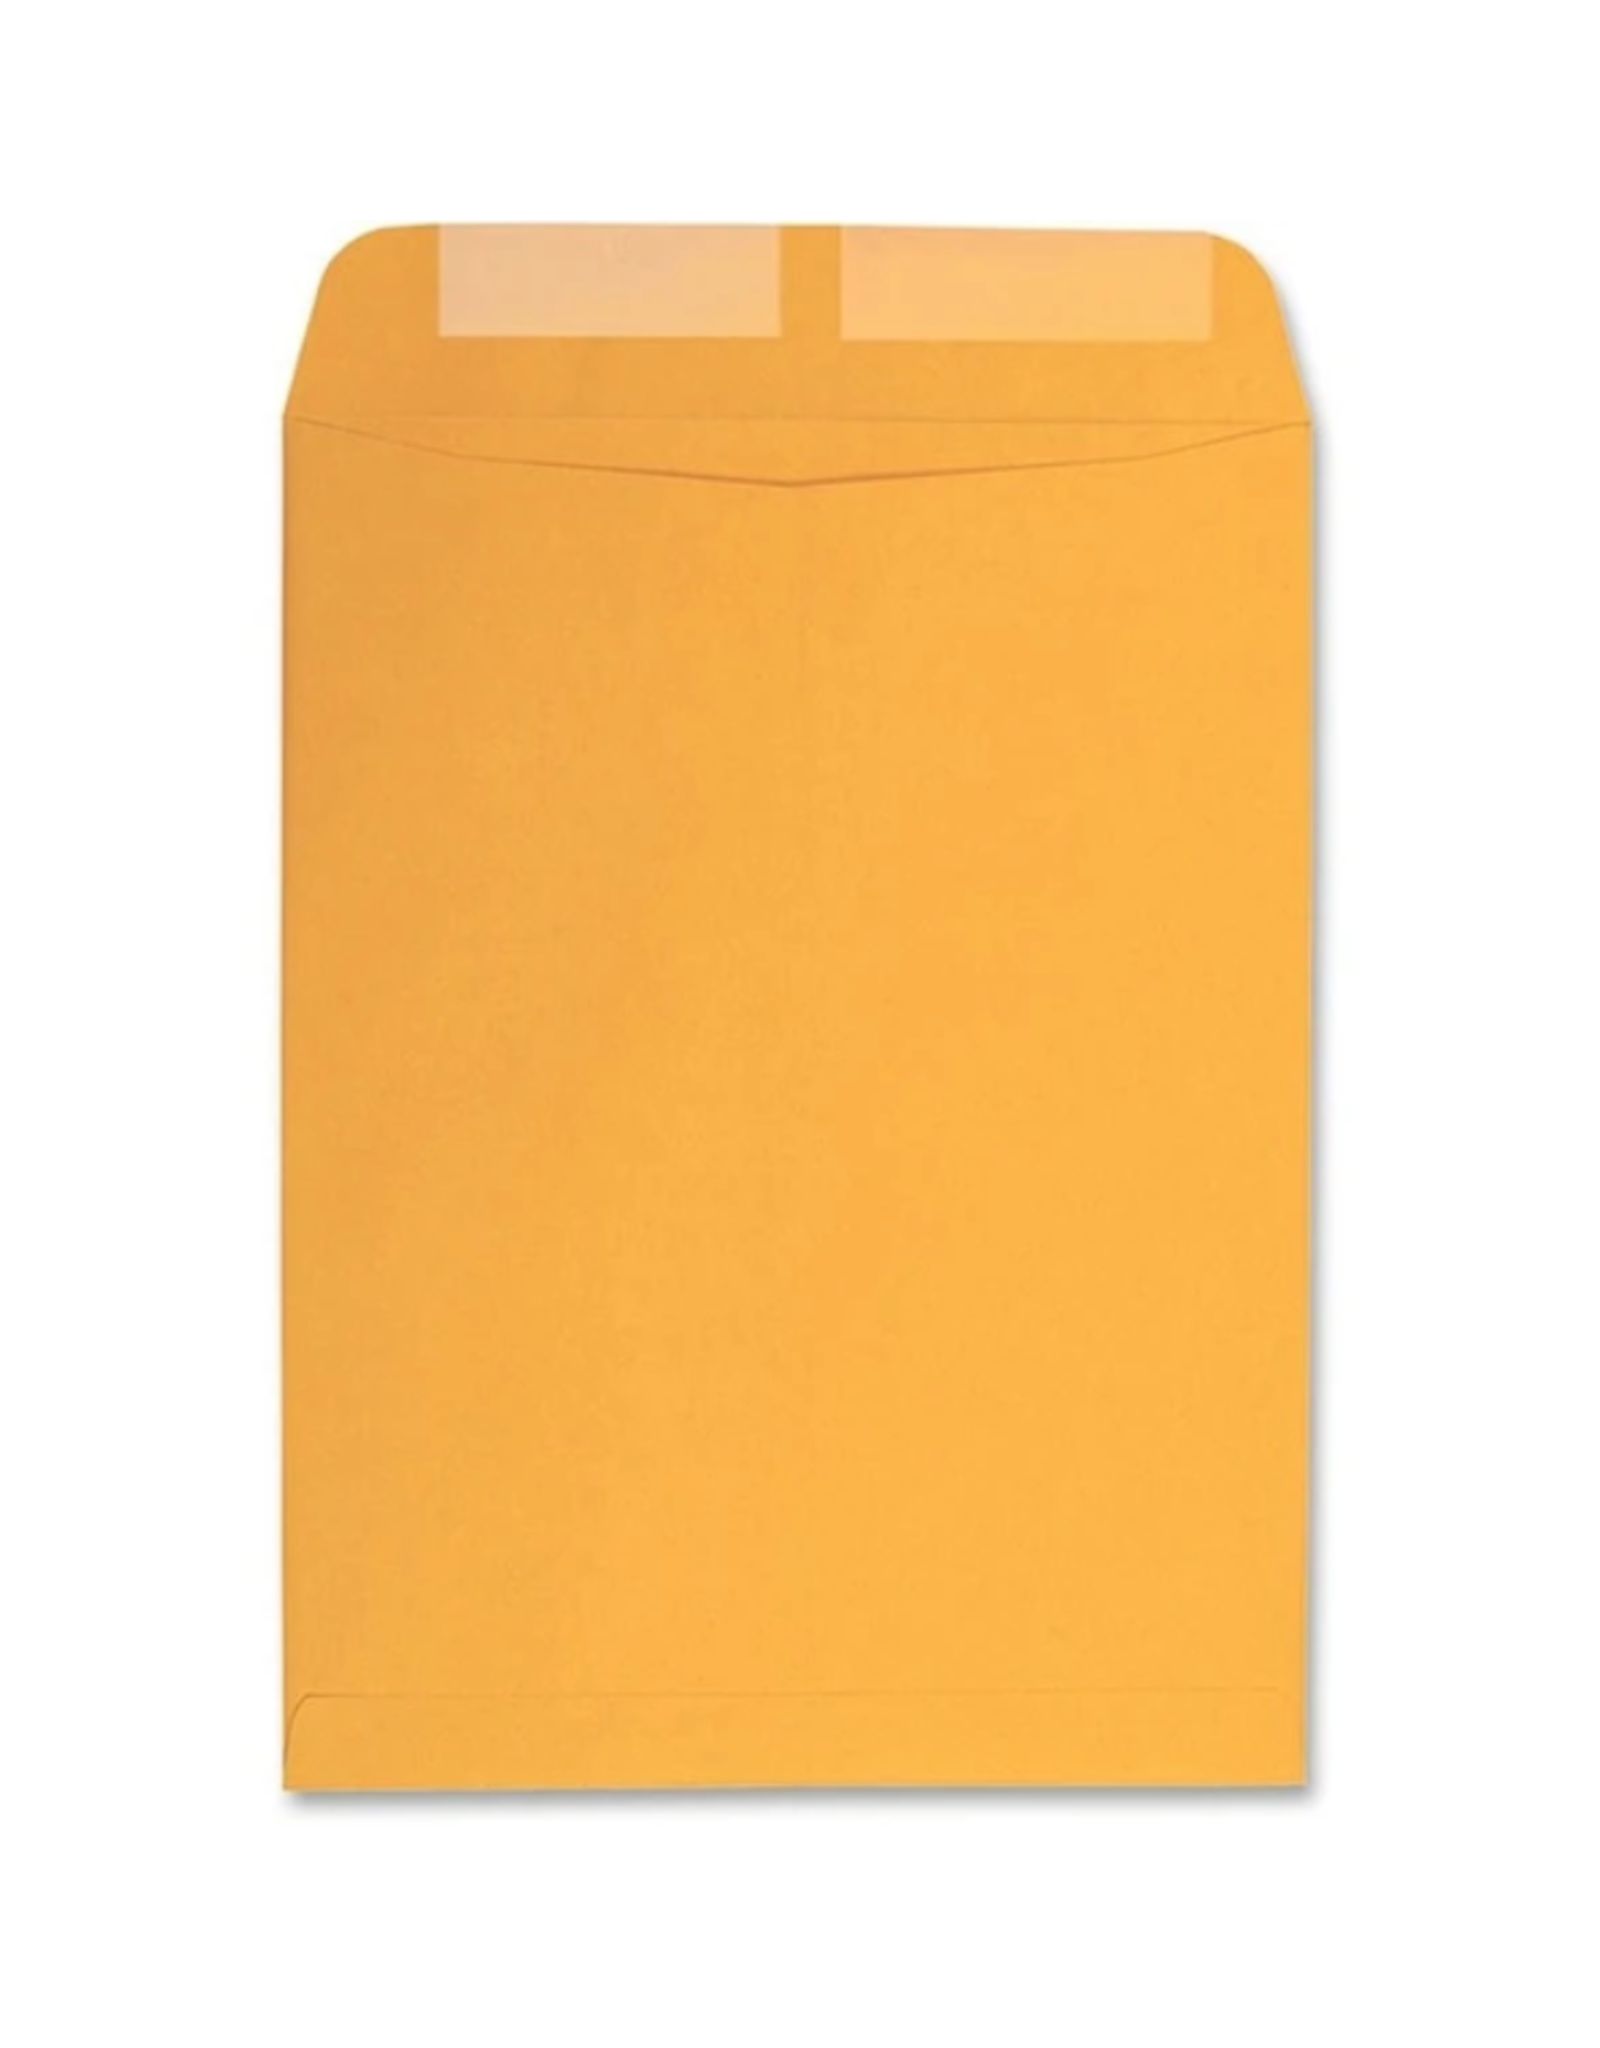 SUPREMEX ENVELOPE-CATALOGUE 12X15.5 GOLDEN KRAFT, 250/BOX